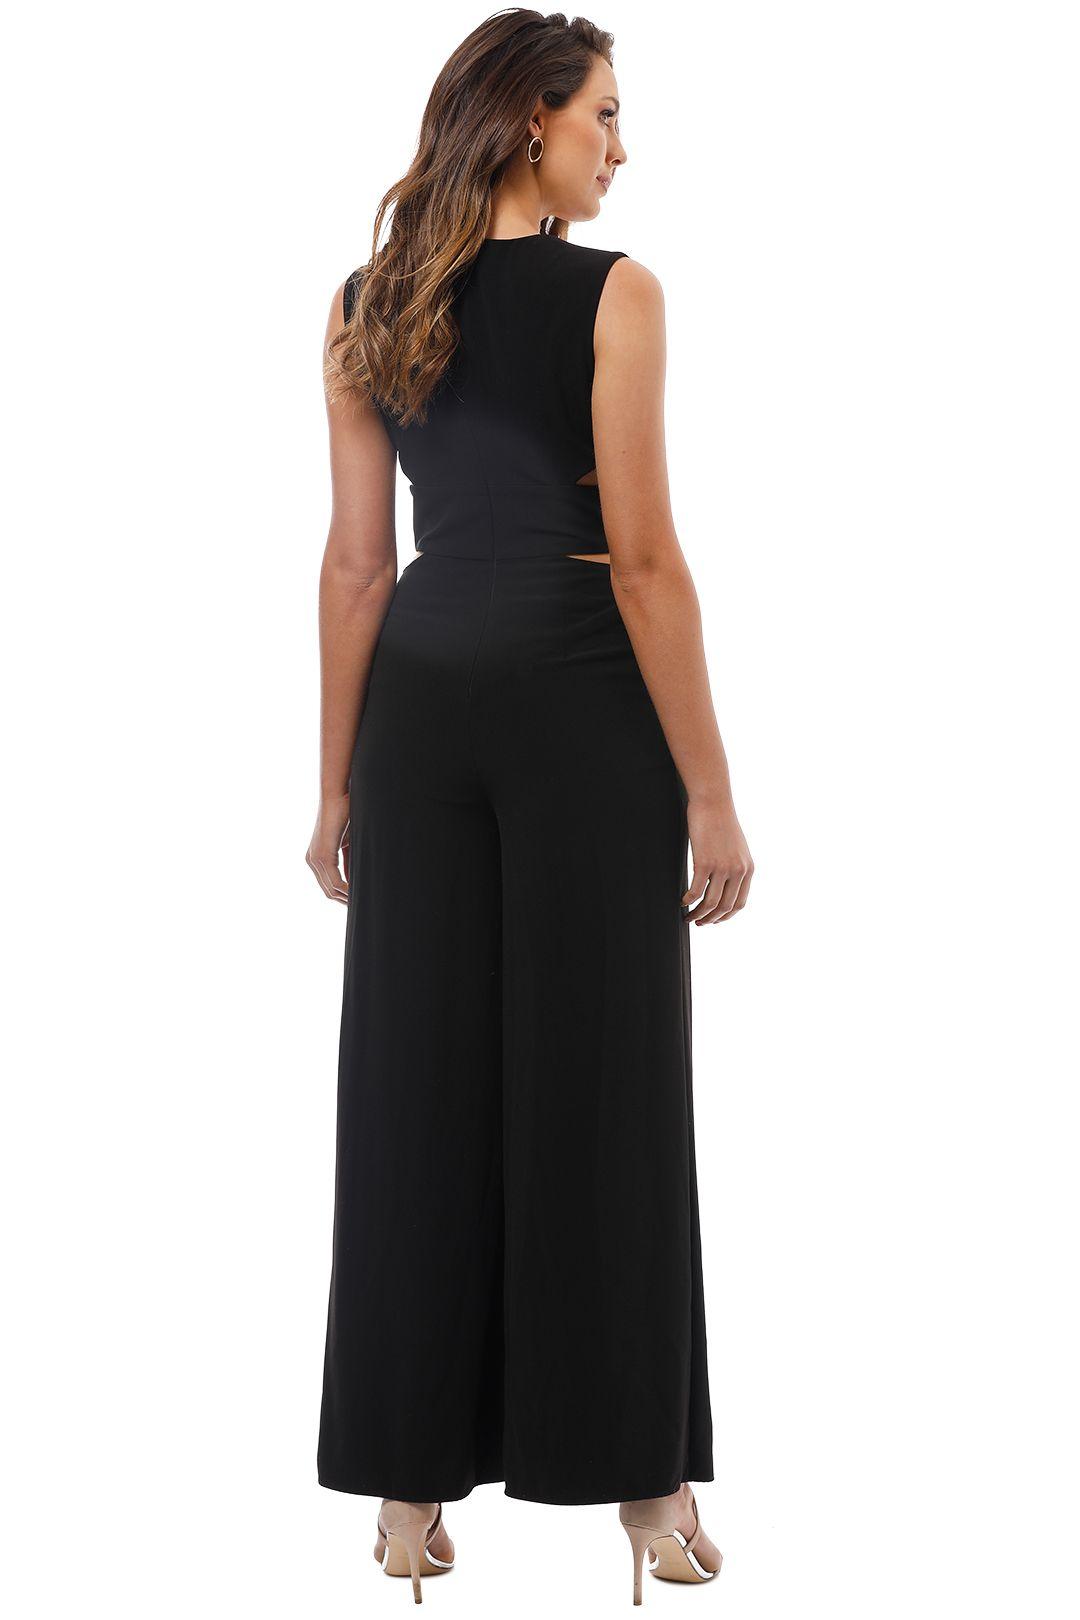 Pasduchas - Santa Fe Dress - Ivory - Back